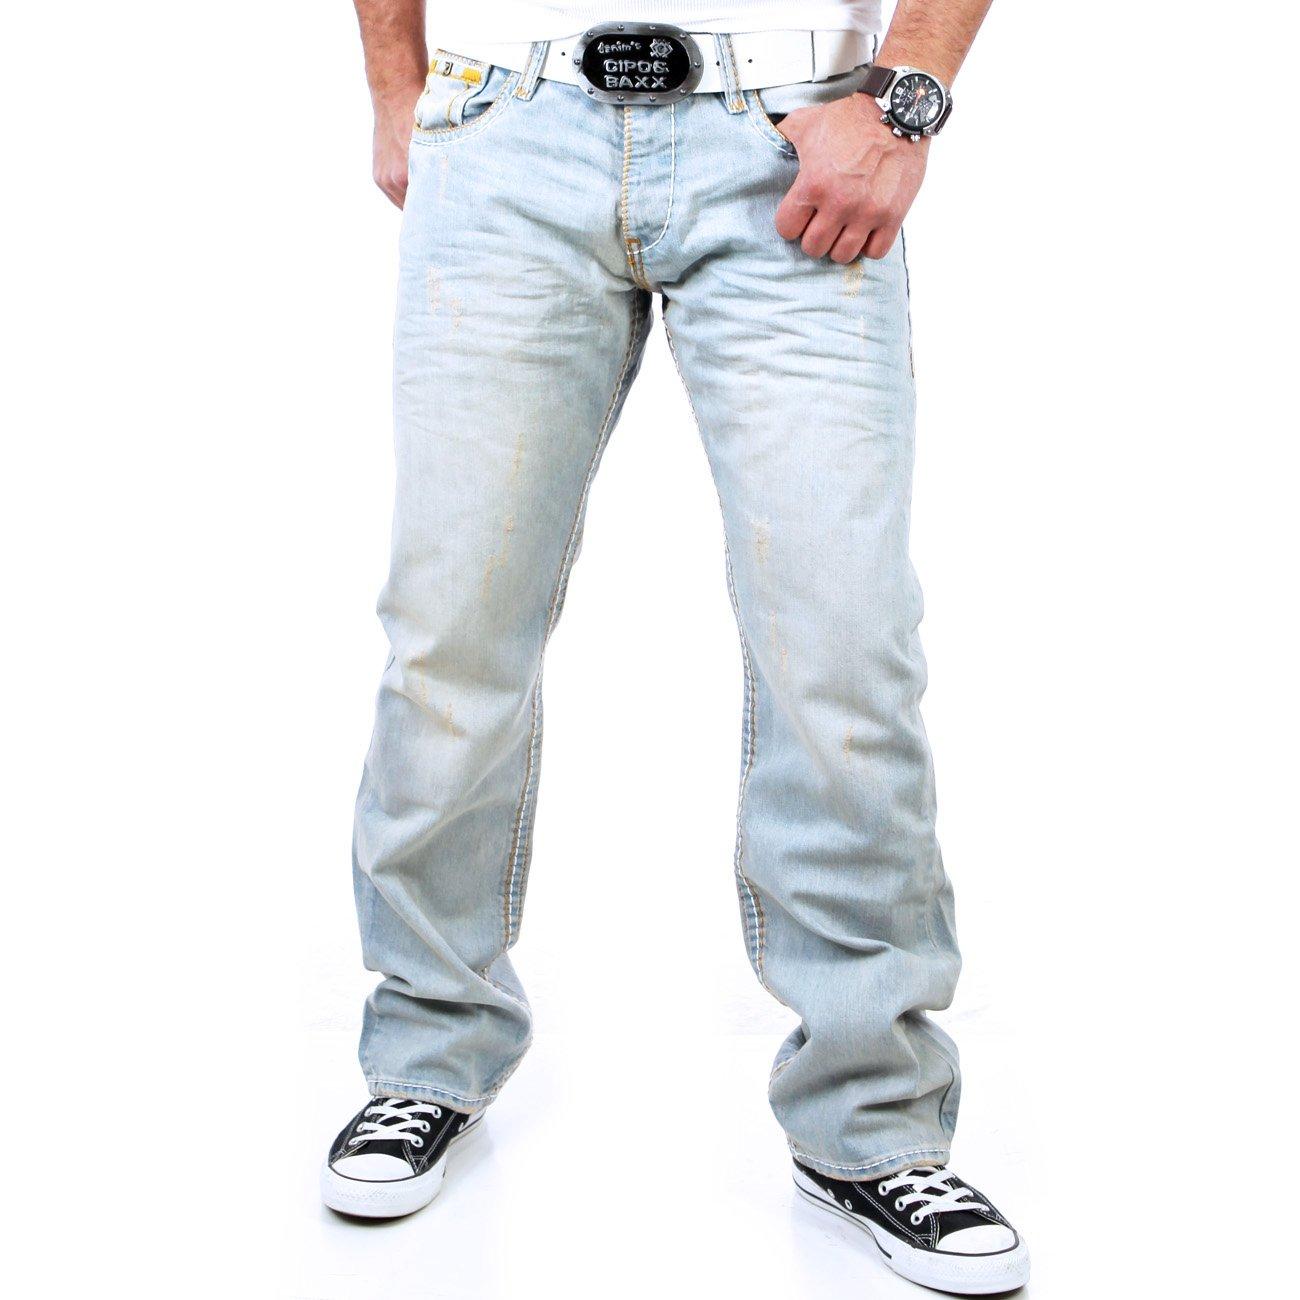 tazzio herren used look dicke naht jeans hose tz 5165 blau. Black Bedroom Furniture Sets. Home Design Ideas